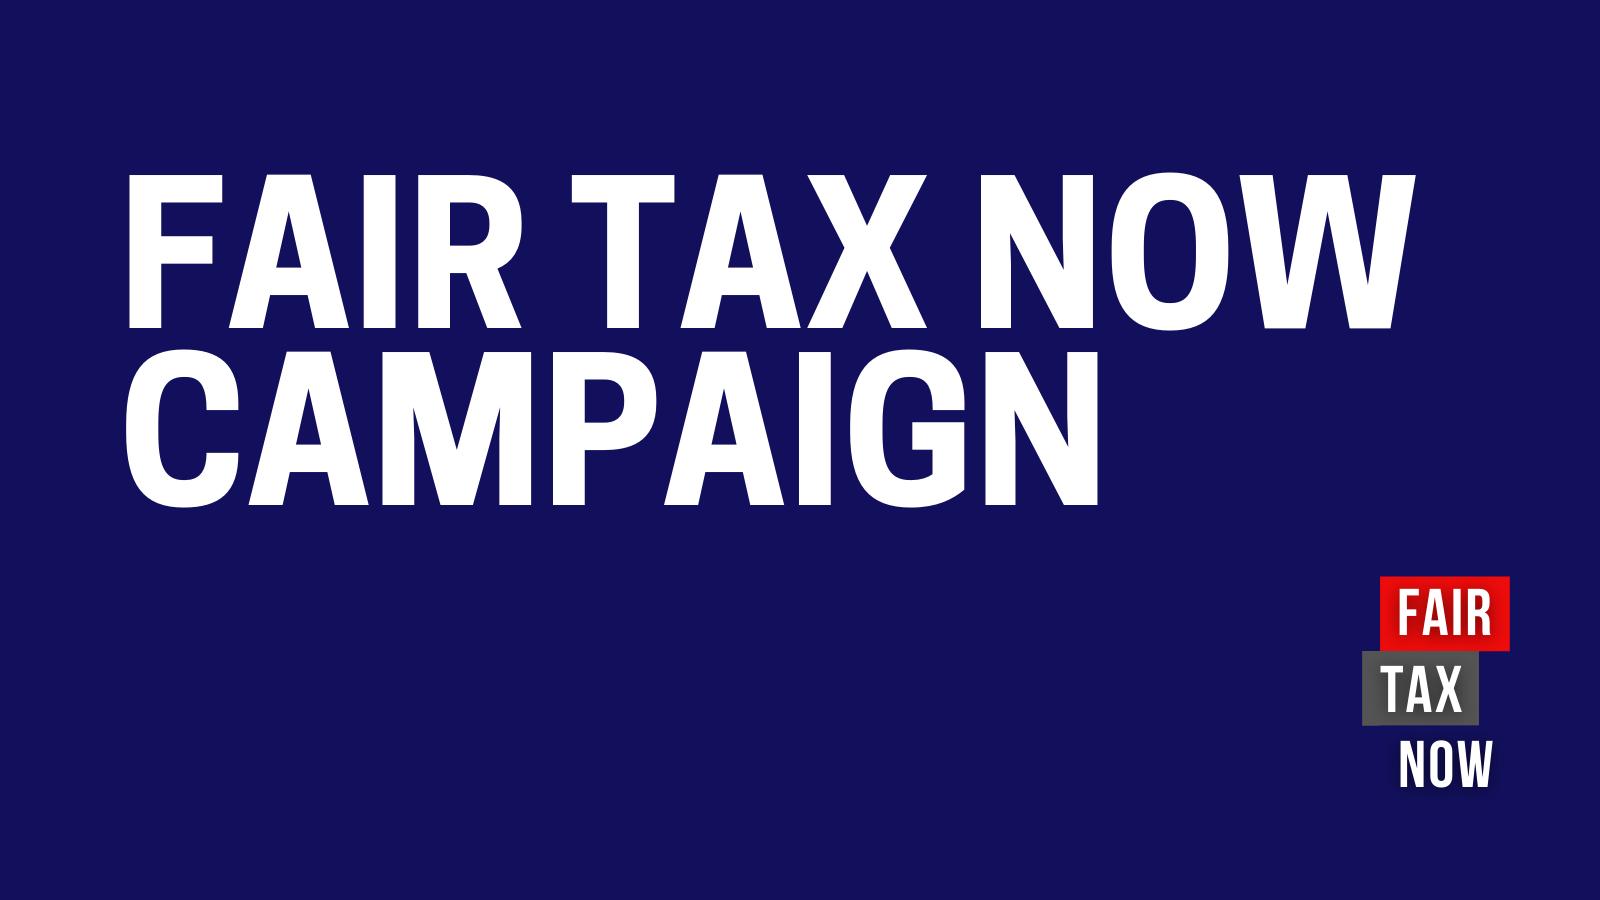 CATJ launch Fair Tax Now Campaign